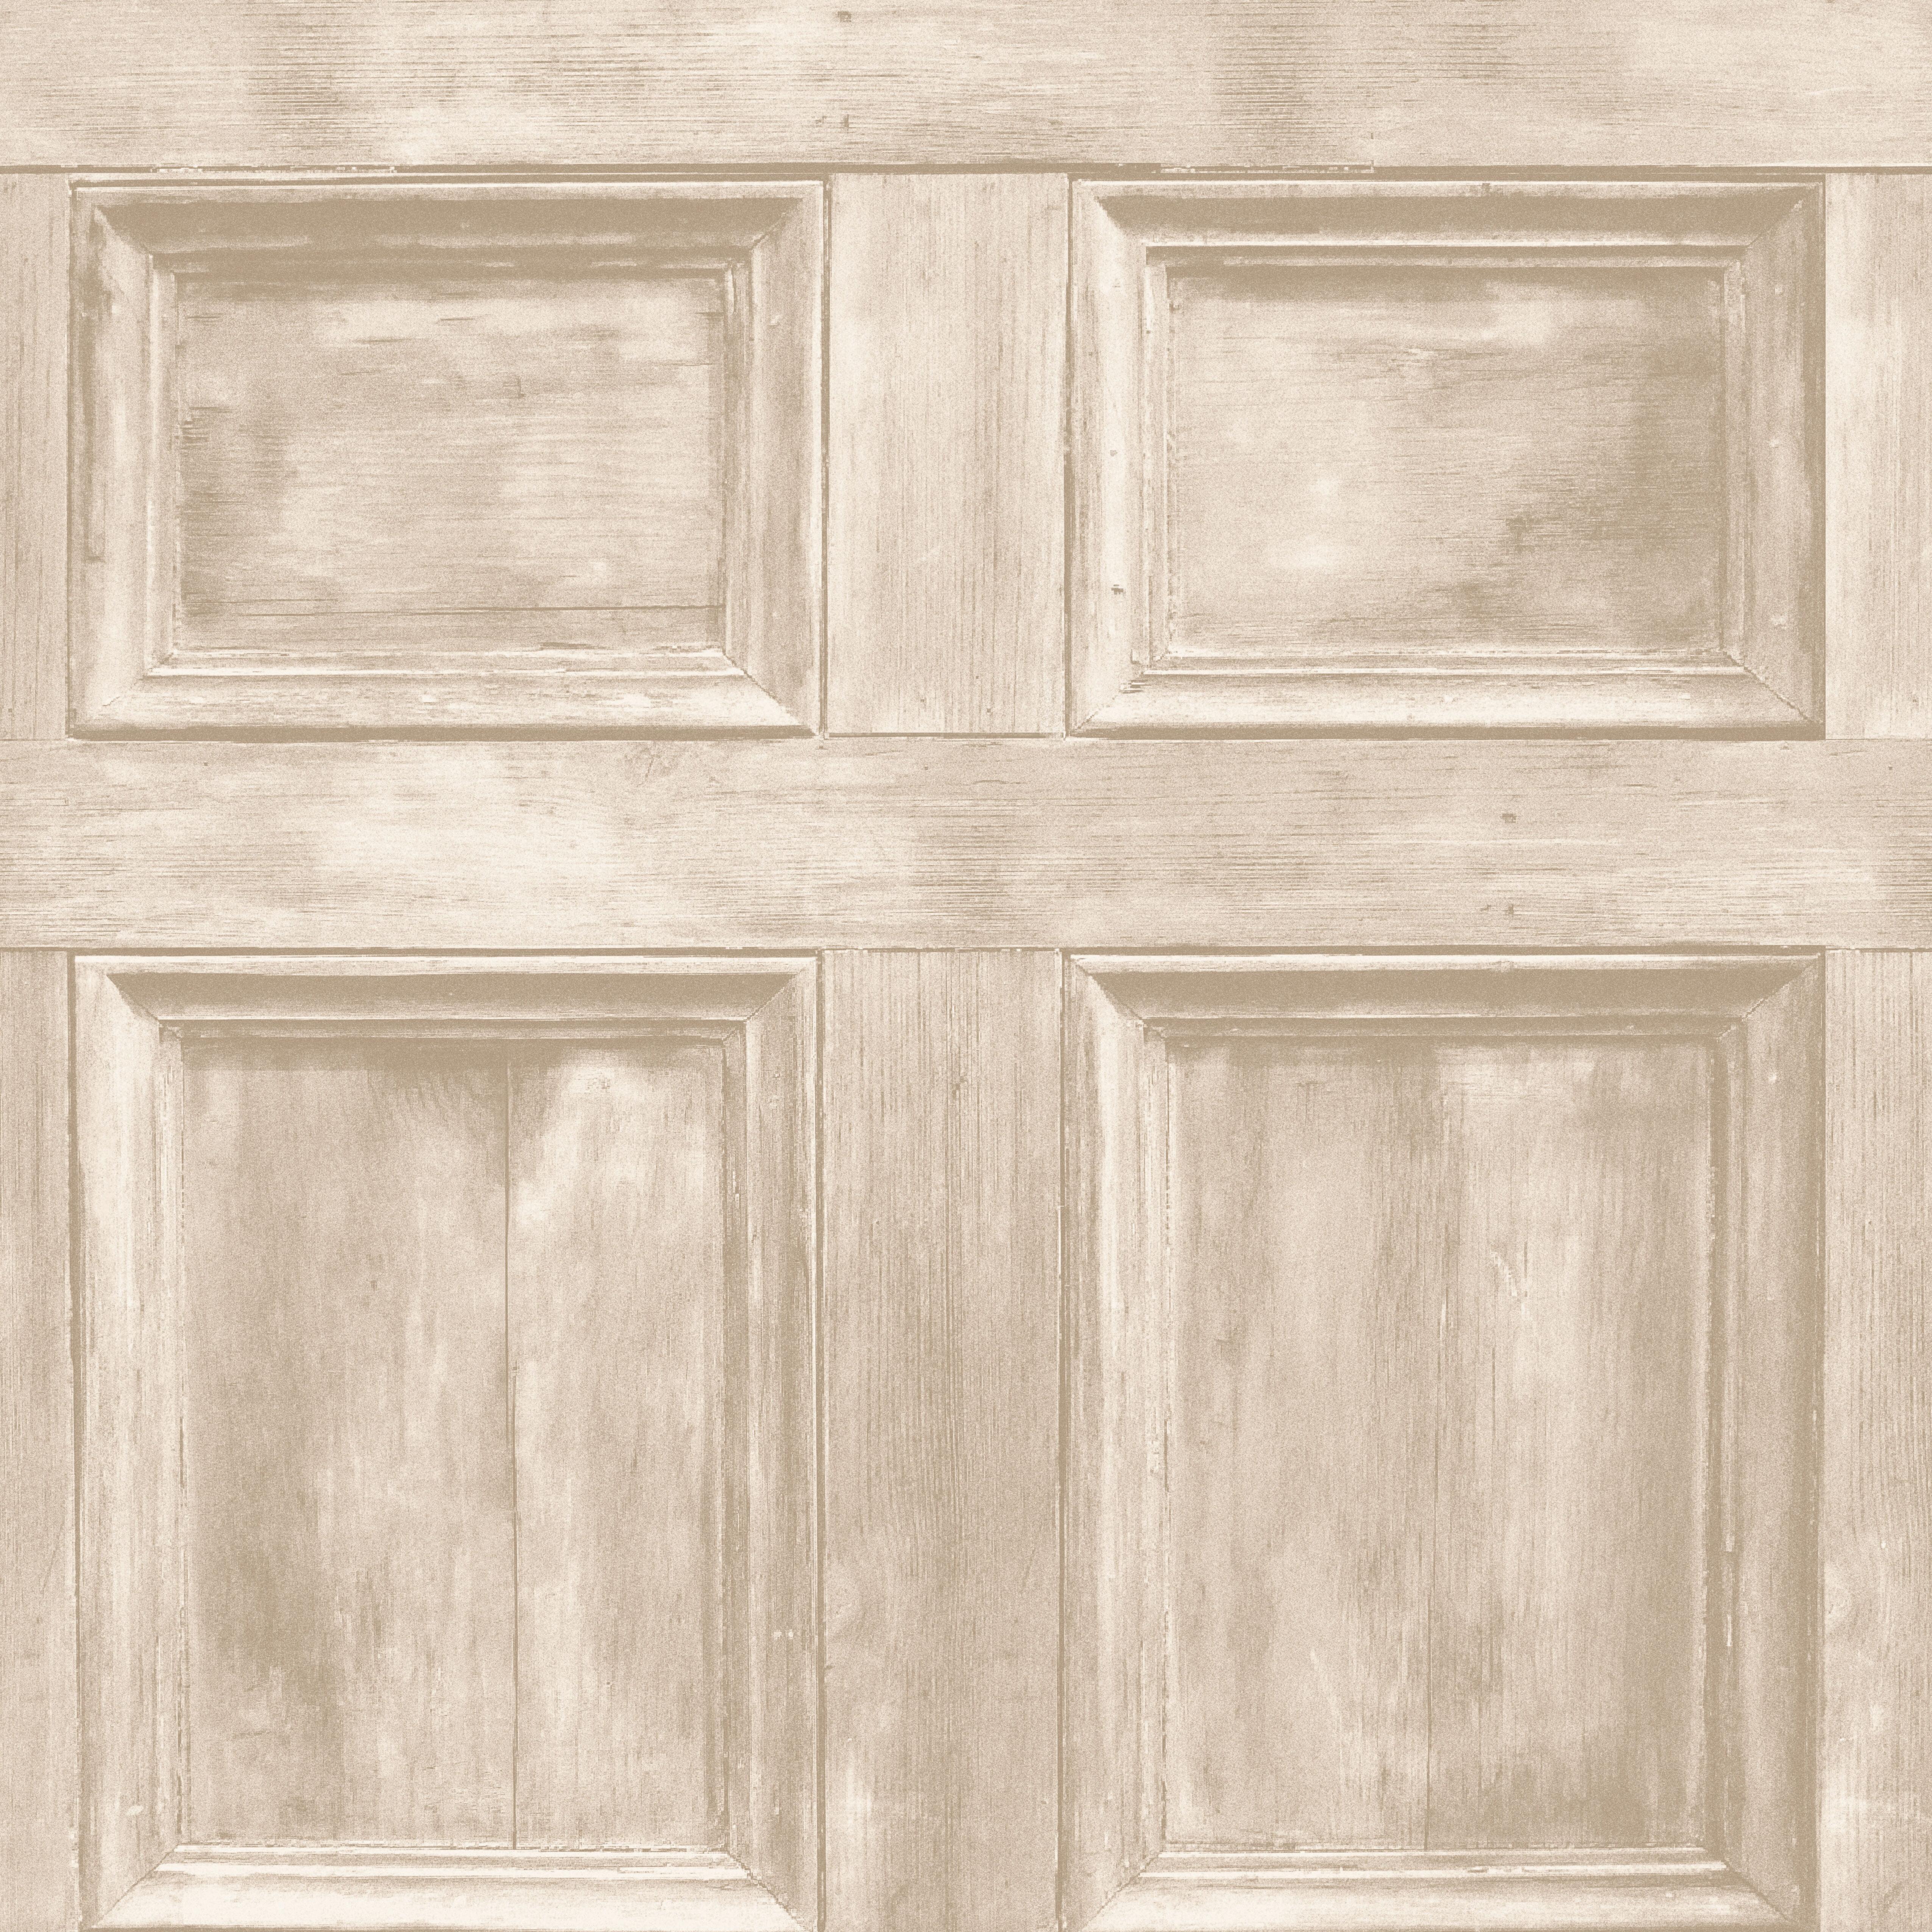 Hazelwood Home Distinctive Wood Panel Sidewall 10m X 52cm Wallpaper